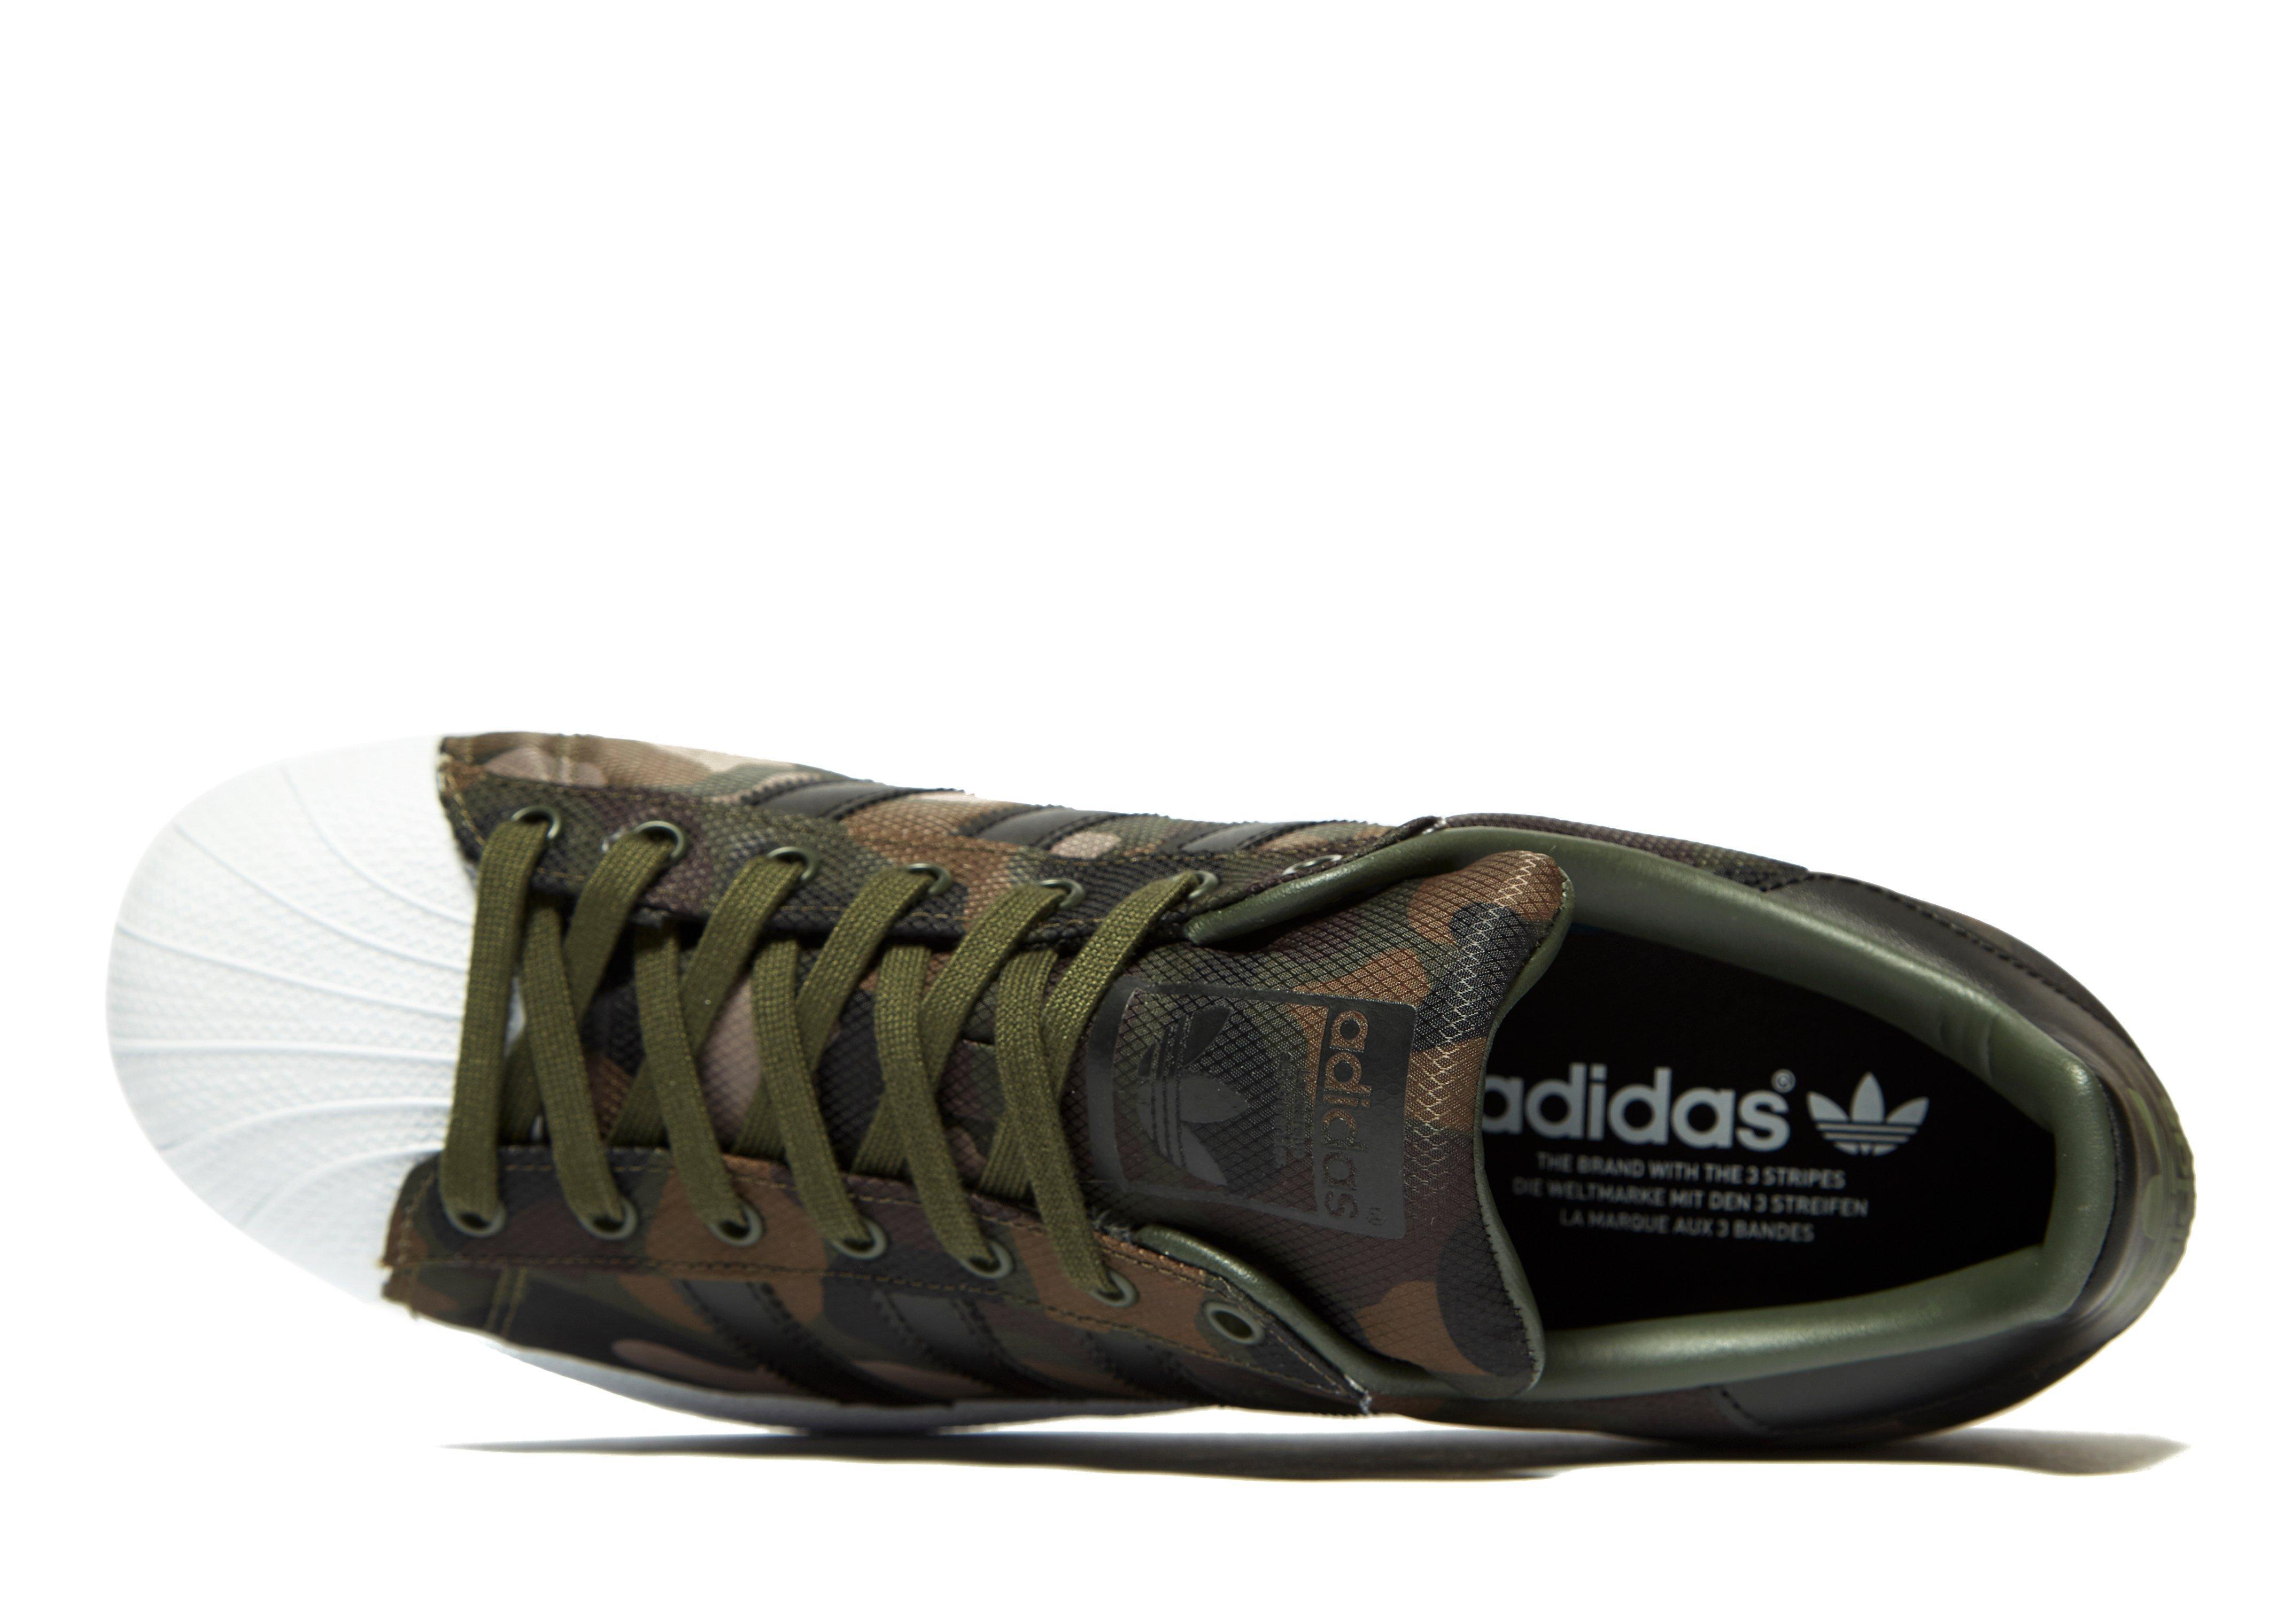 adidas Originals Rubber Superstar Camo in Cargo (Green) for Men